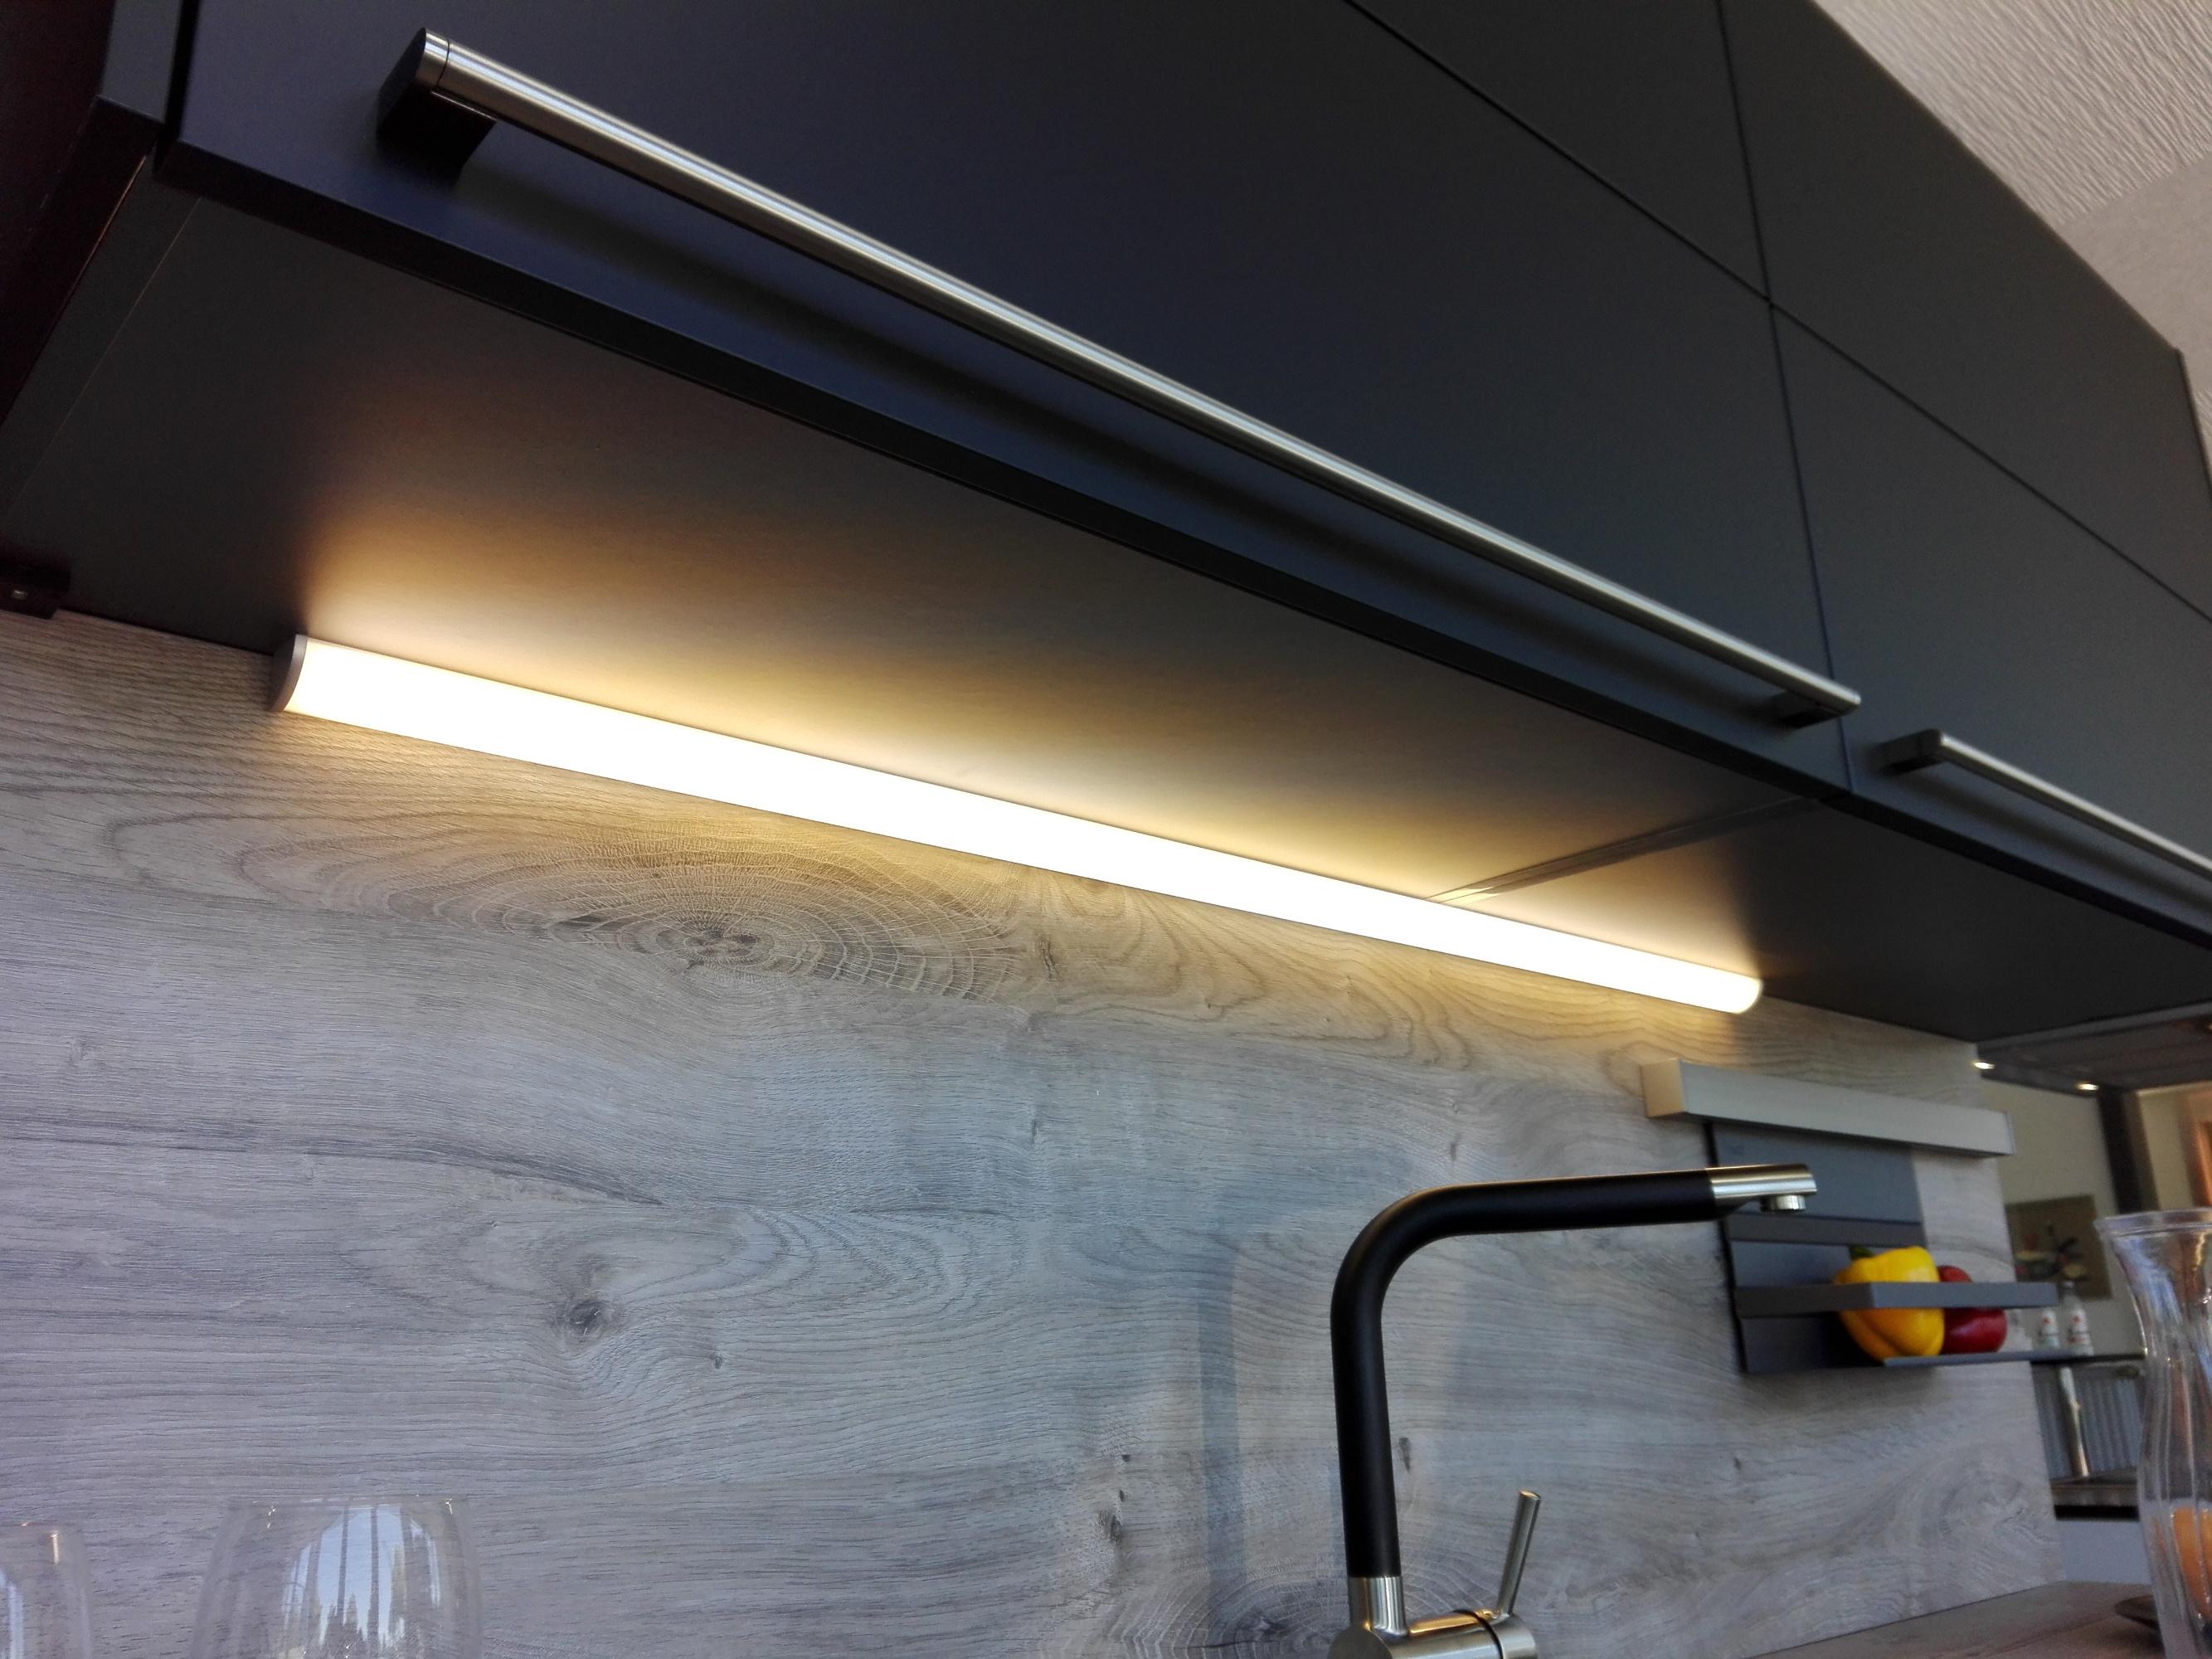 Küche 4 - Langfeld LED Beleuchtung